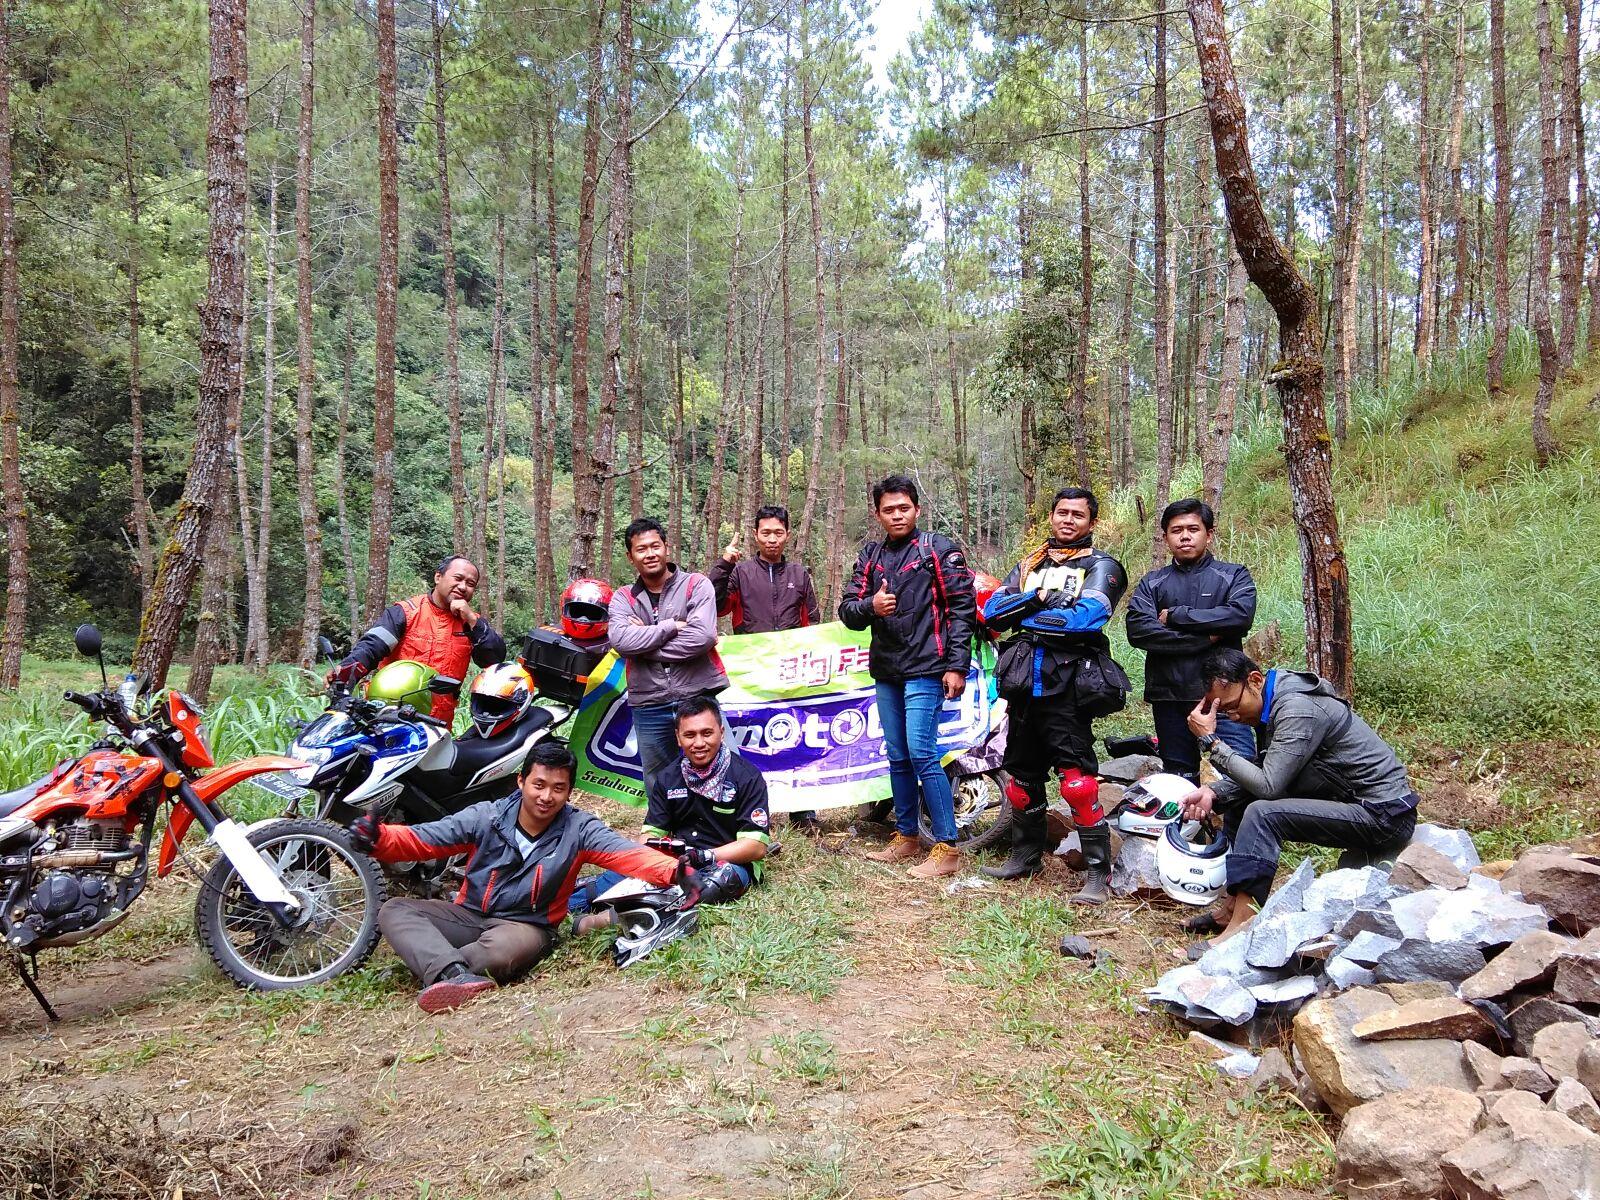 Motomazine Road to HBD Jatimotoblog di Bumi Majapahit